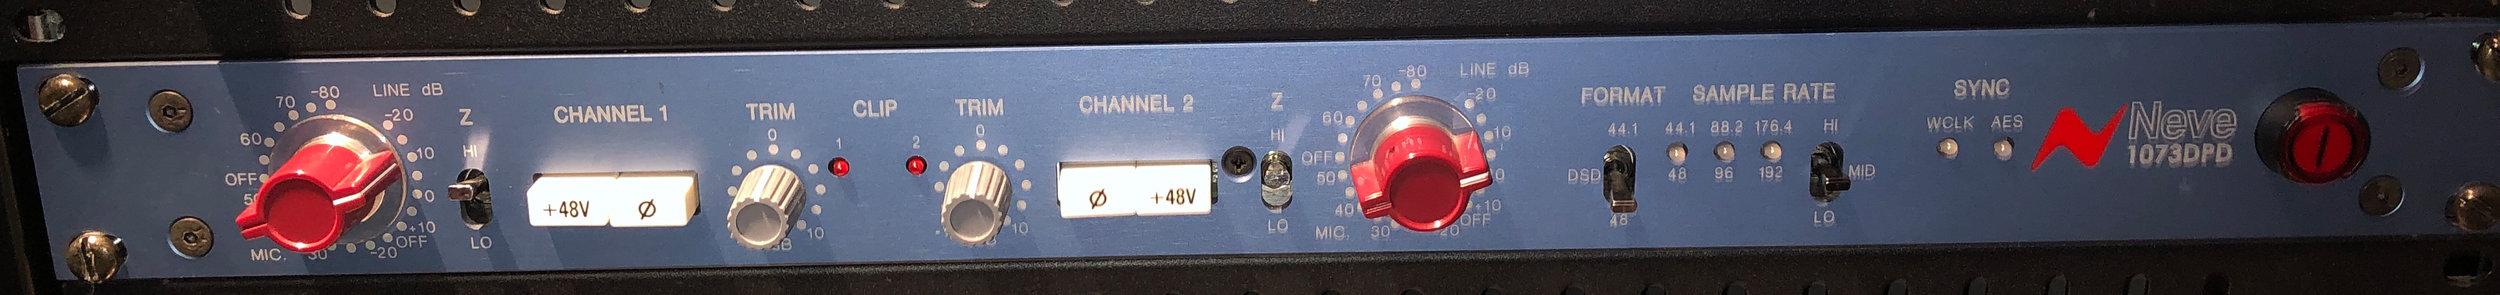 Neve 1073 DPD: 'The' Pre-Amp! Foto: privat